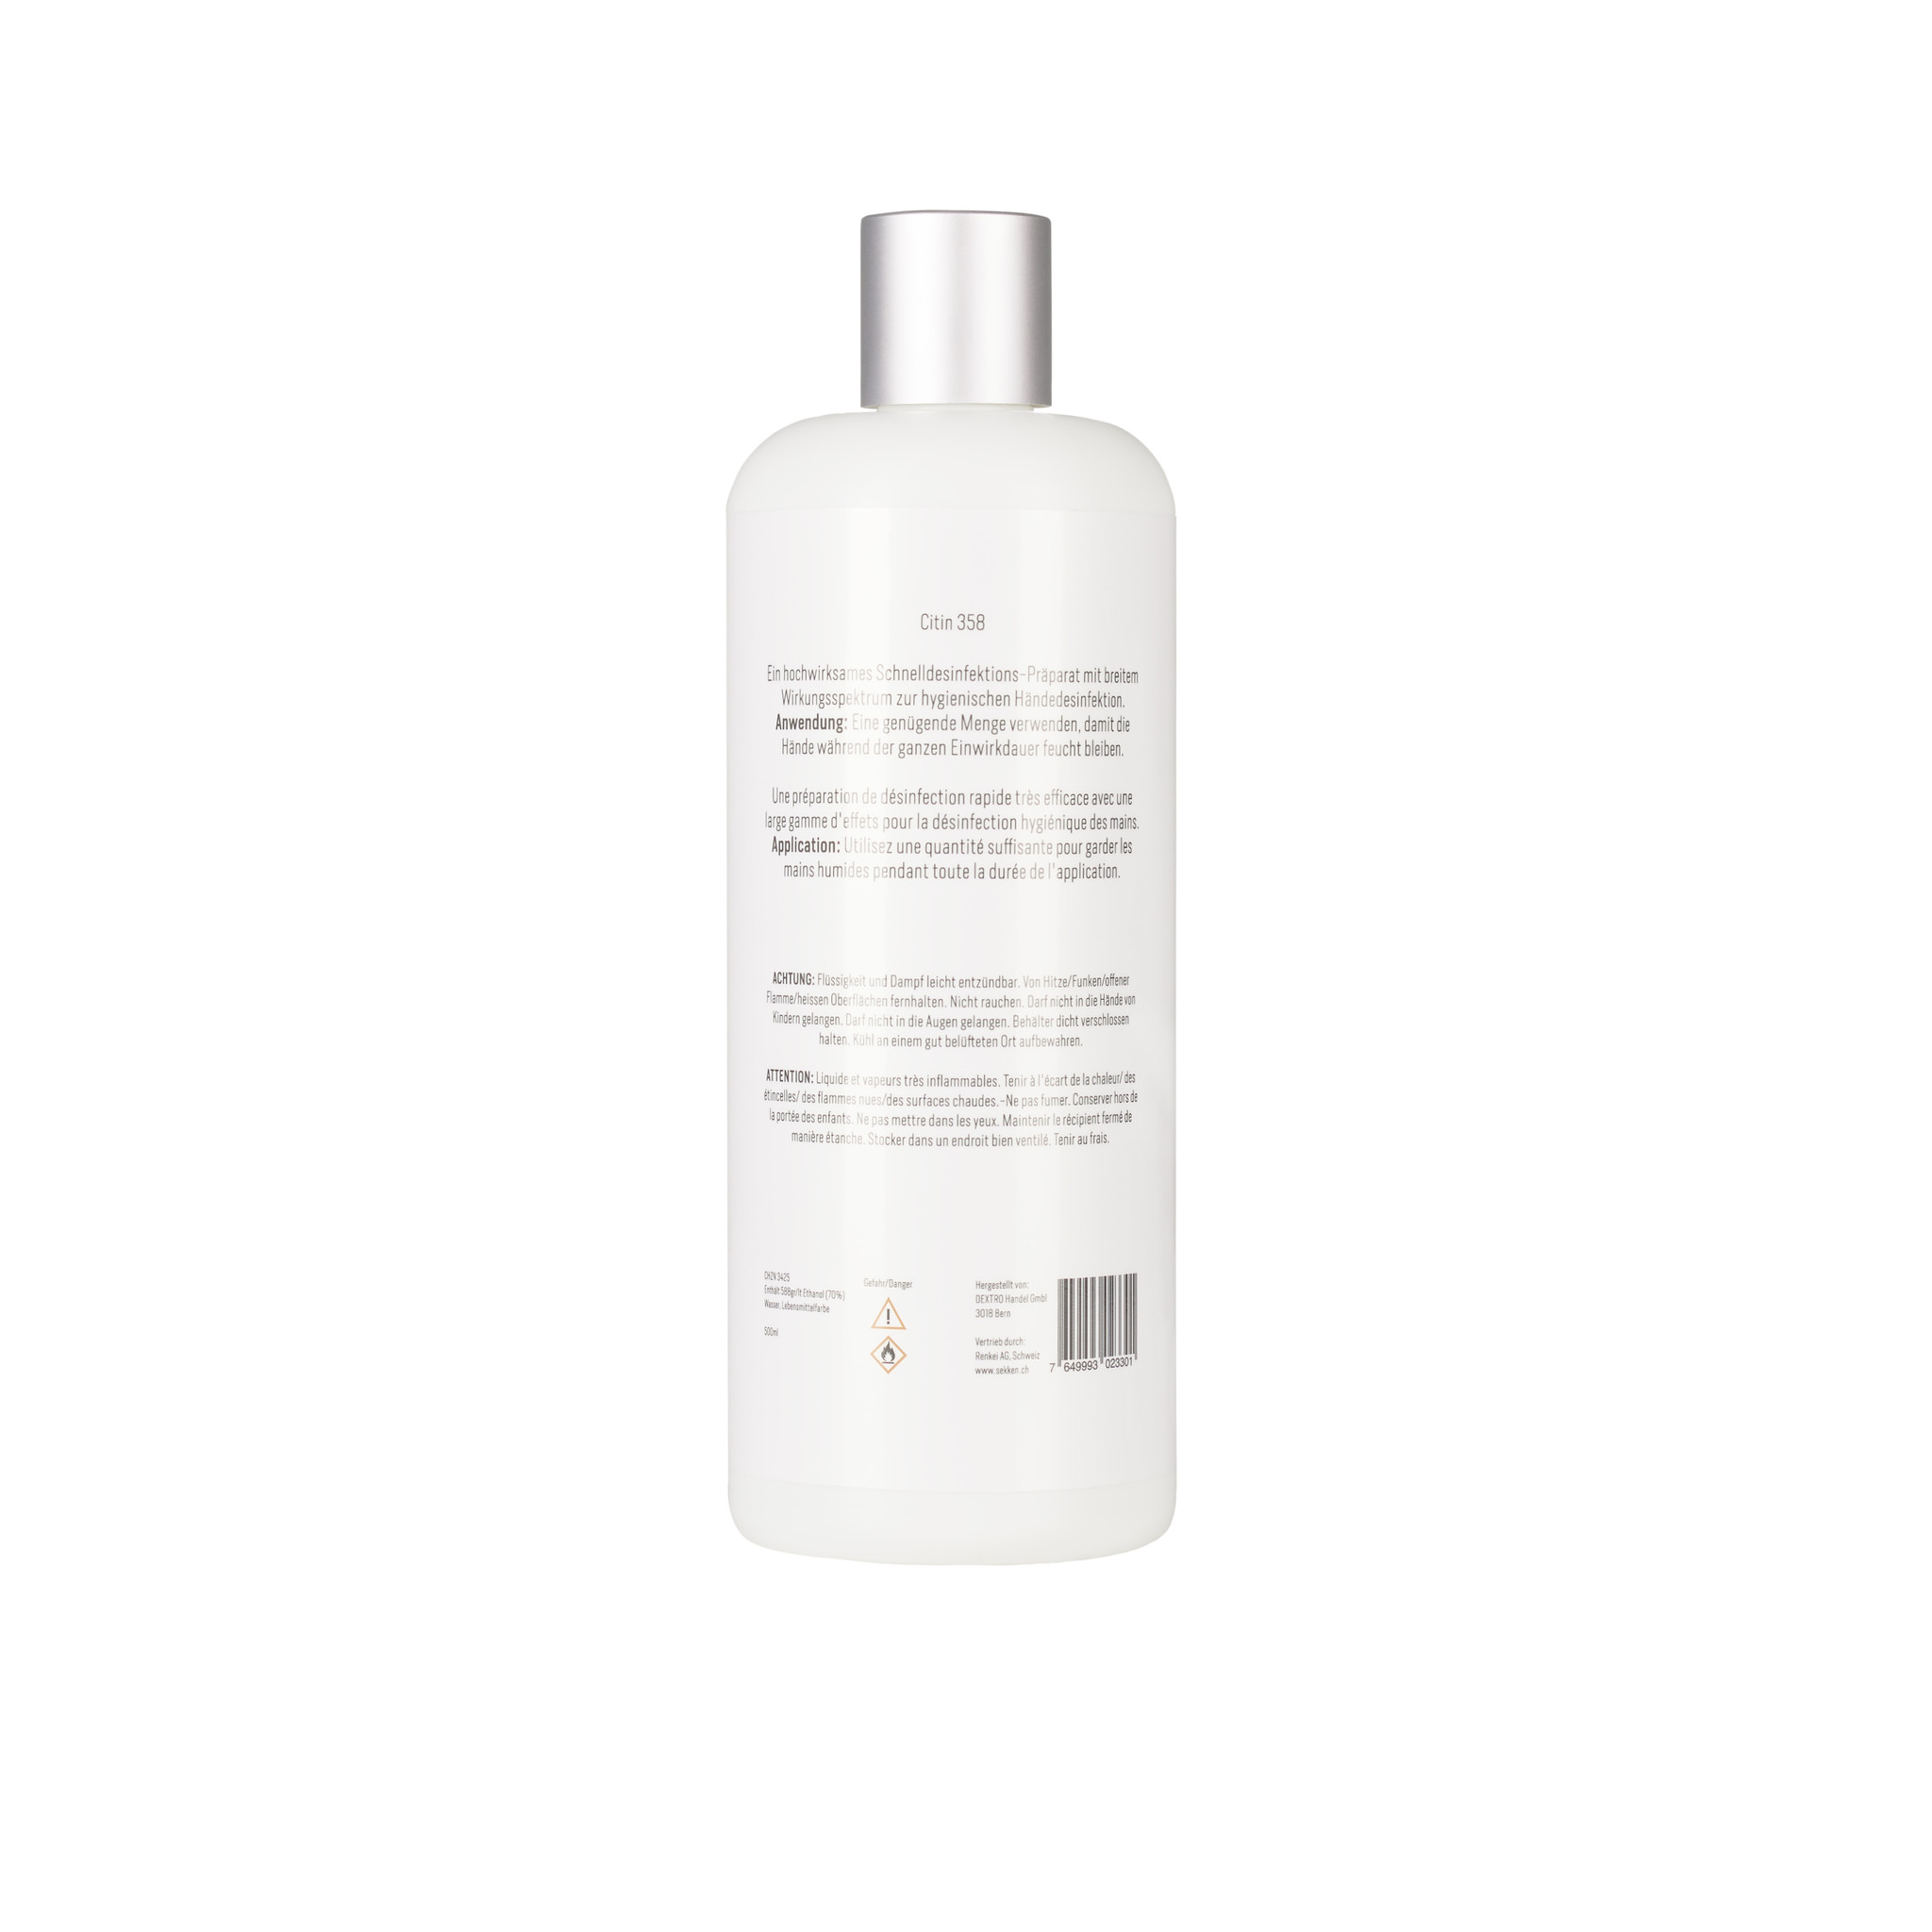 Hand Sanitizer Citin 358 500ml-2